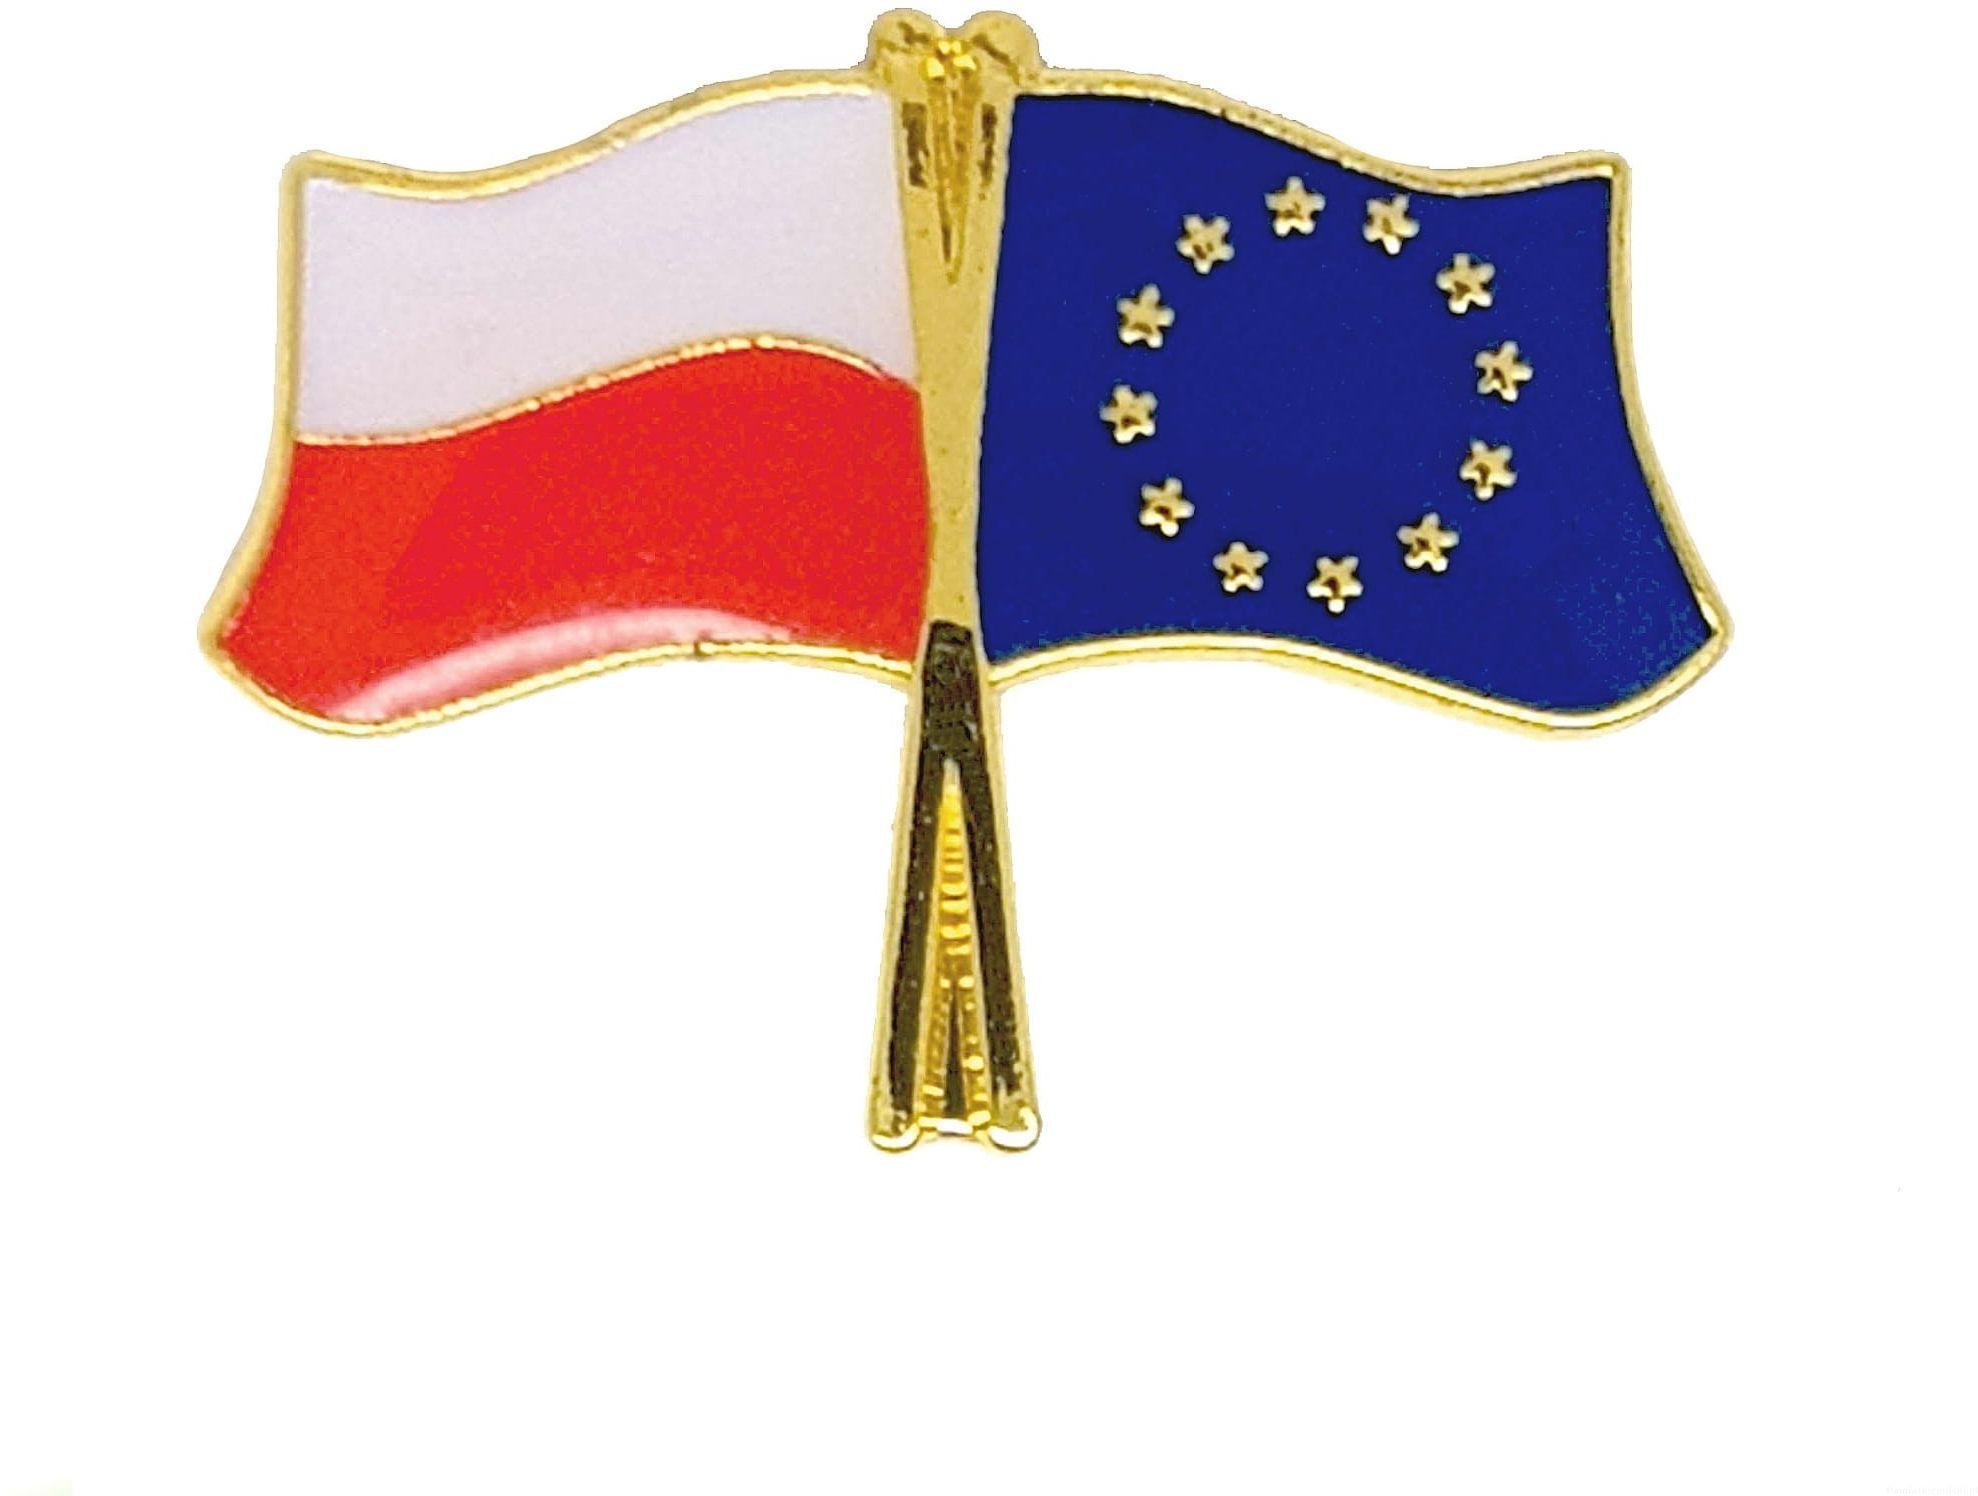 Flaga Polska - UE, przypinka